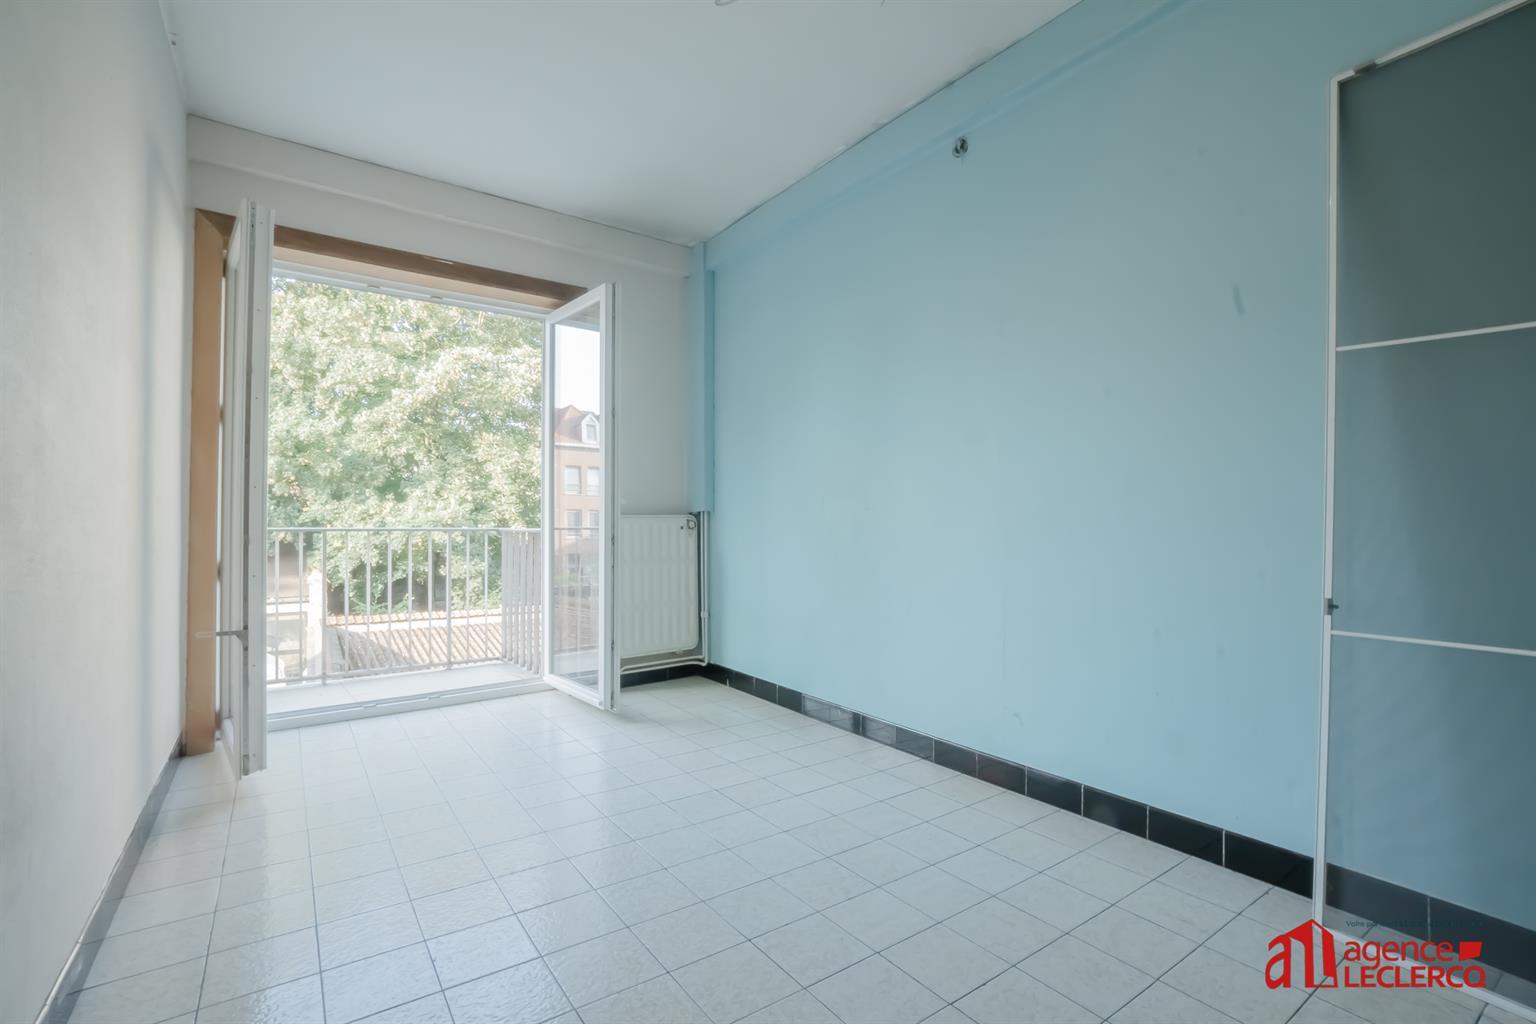 Appartement - Tournai - #4443622-10